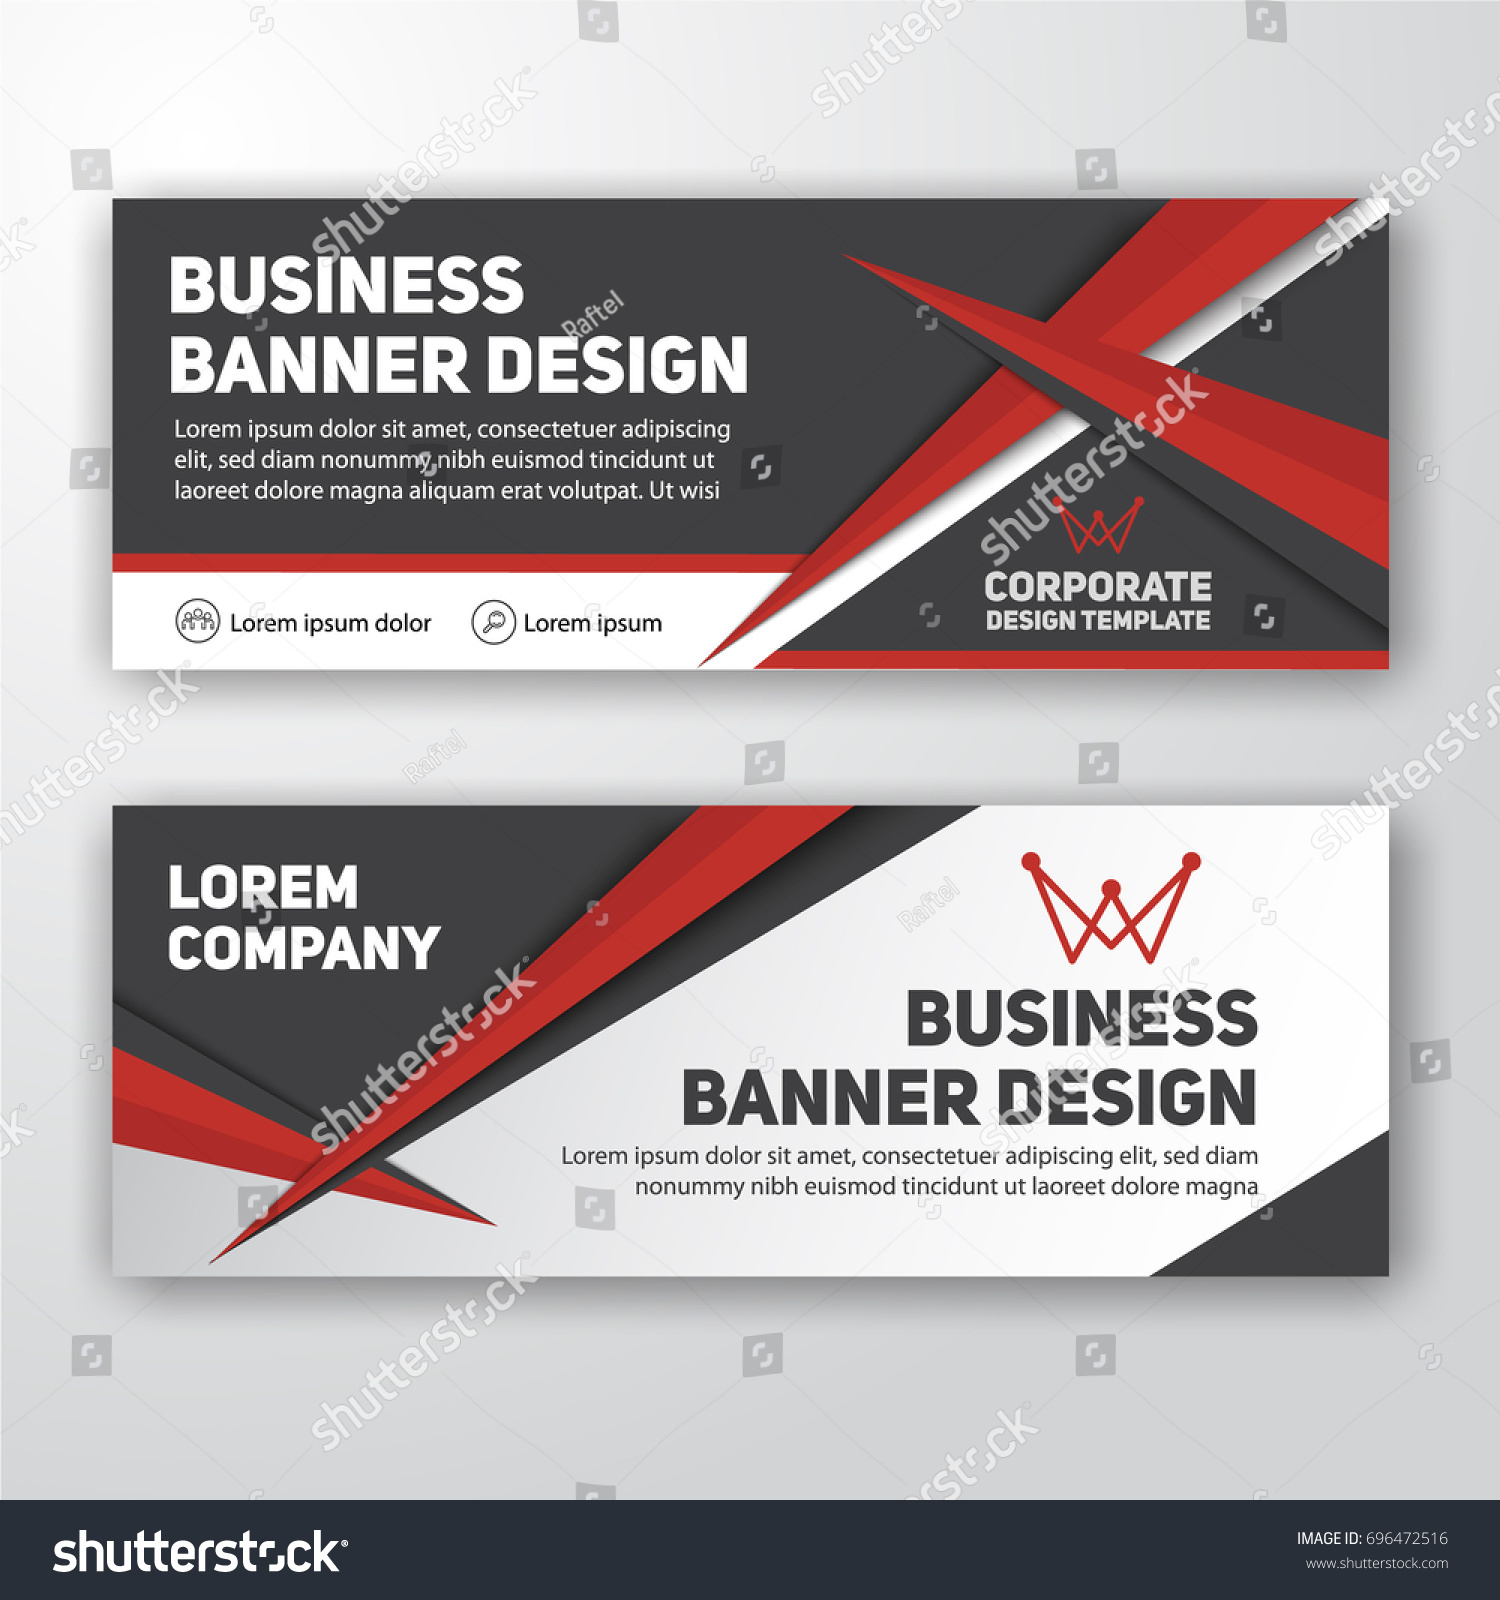 Modern corporate banner background design letterhead stock vector modern corporate banner background design for letterhead document header web banner vector illustration spiritdancerdesigns Image collections